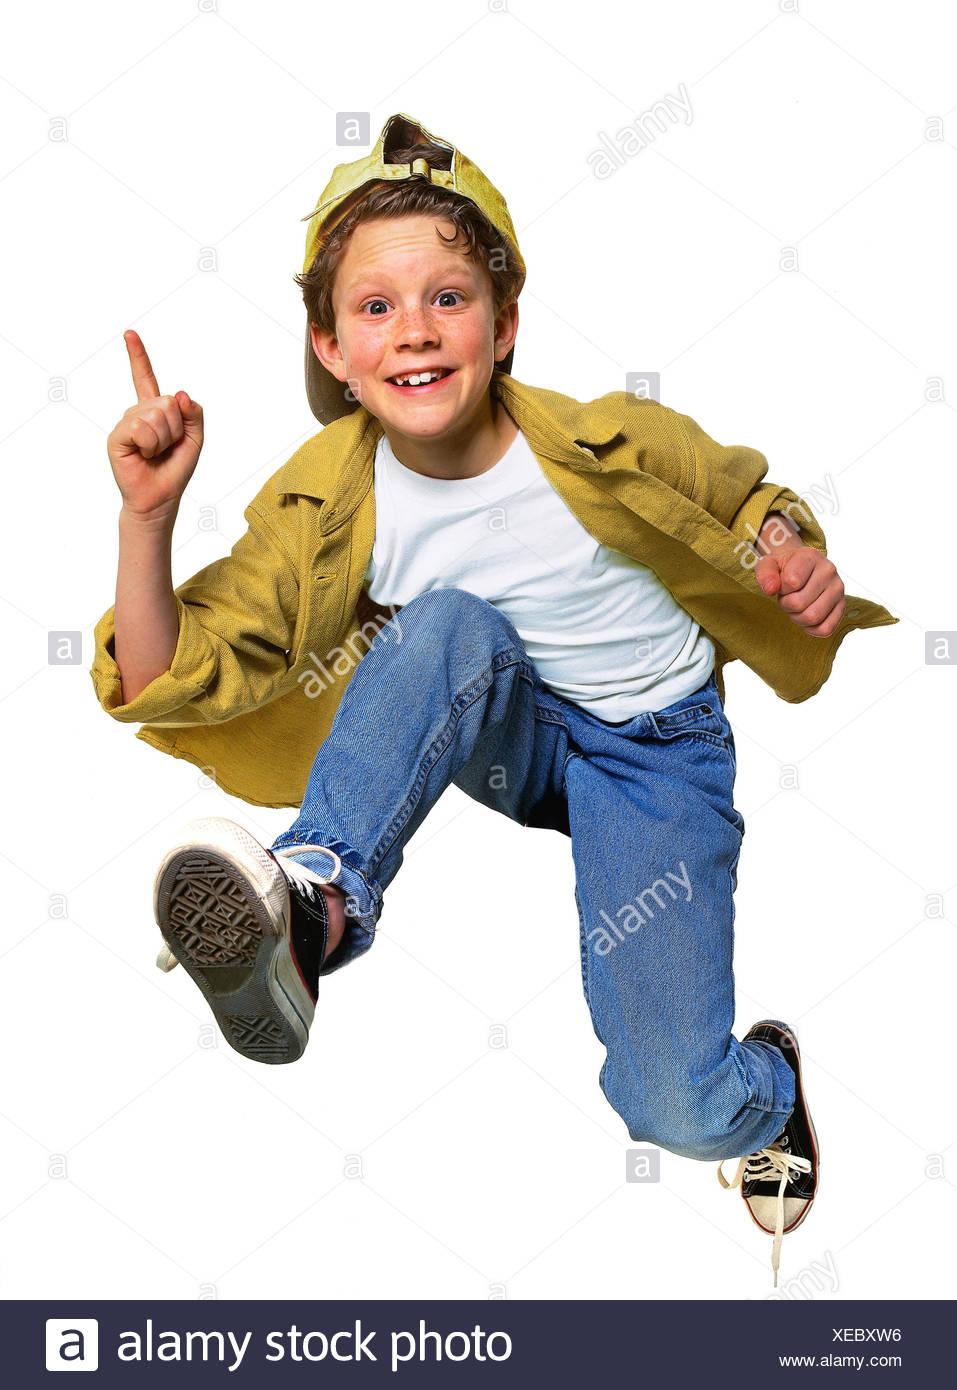 Boy, baseball cap, motion, run, crack, gesture, Children